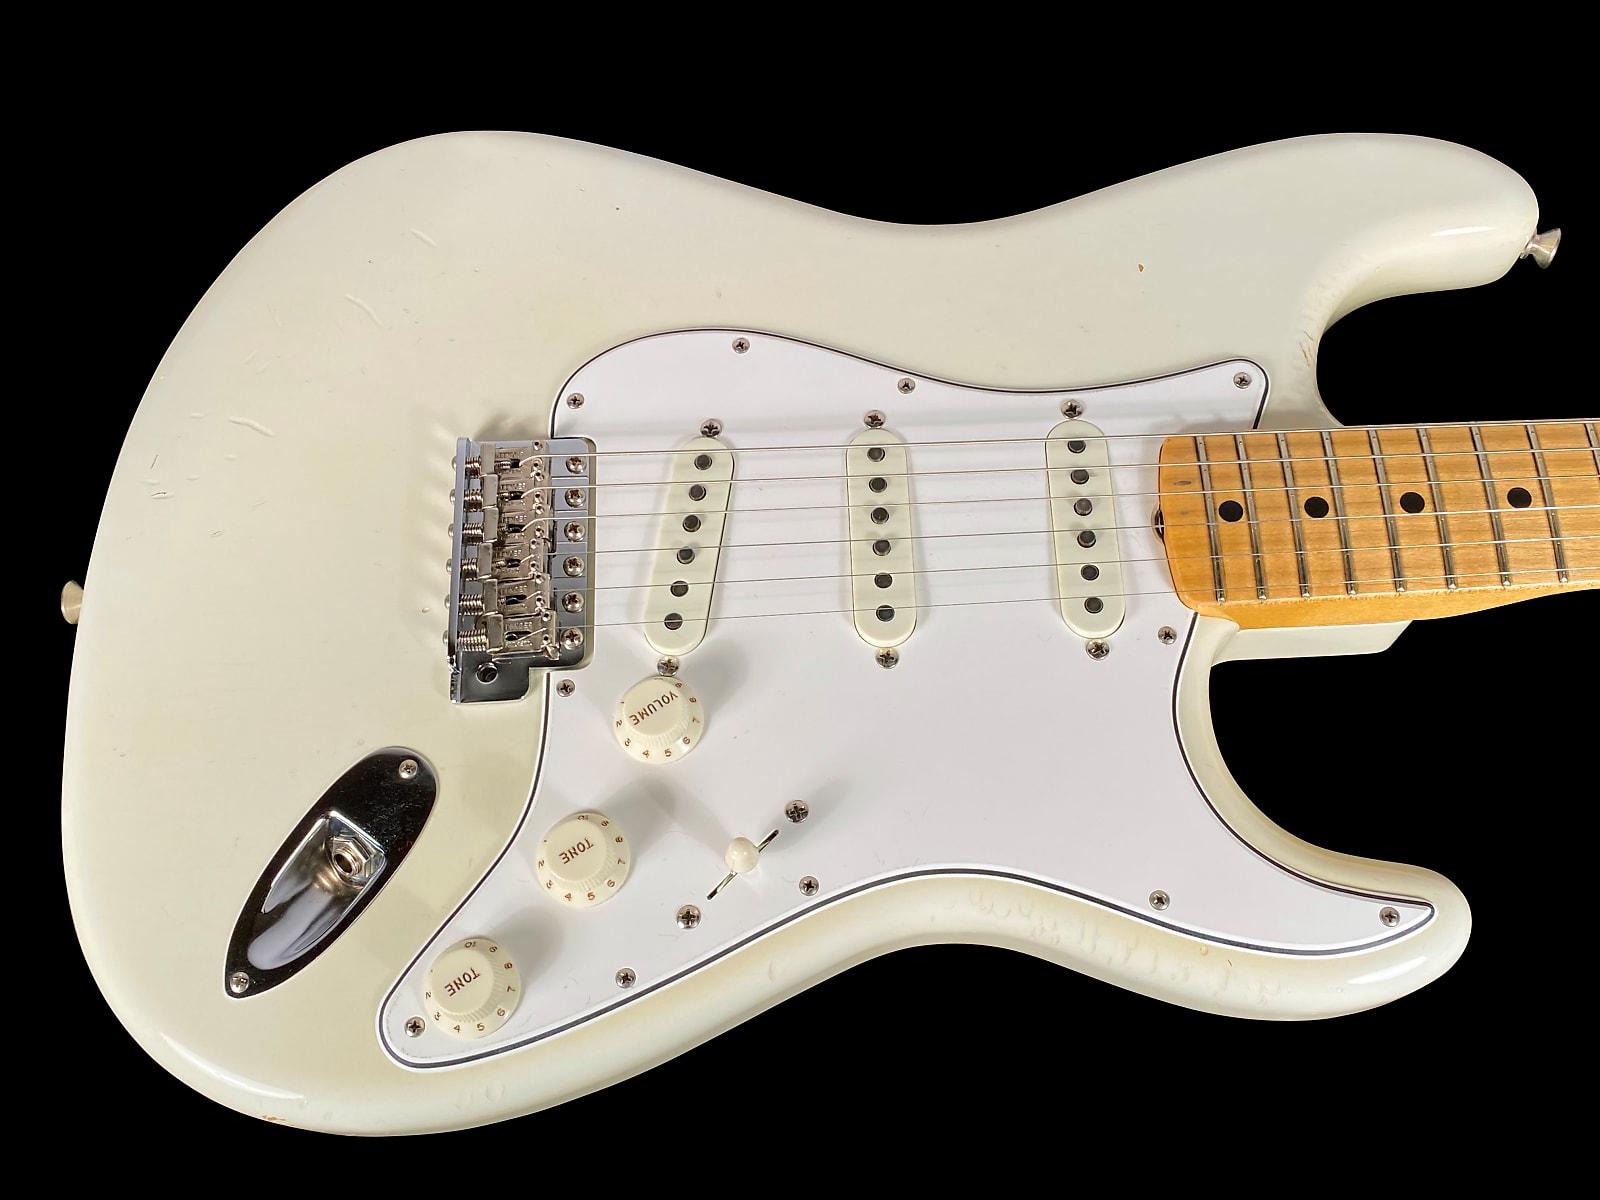 2019 Fender Stratocaster Custom Shop Jimi Hendrix Woodstock Limited Edition Izabella ~ Olympic White